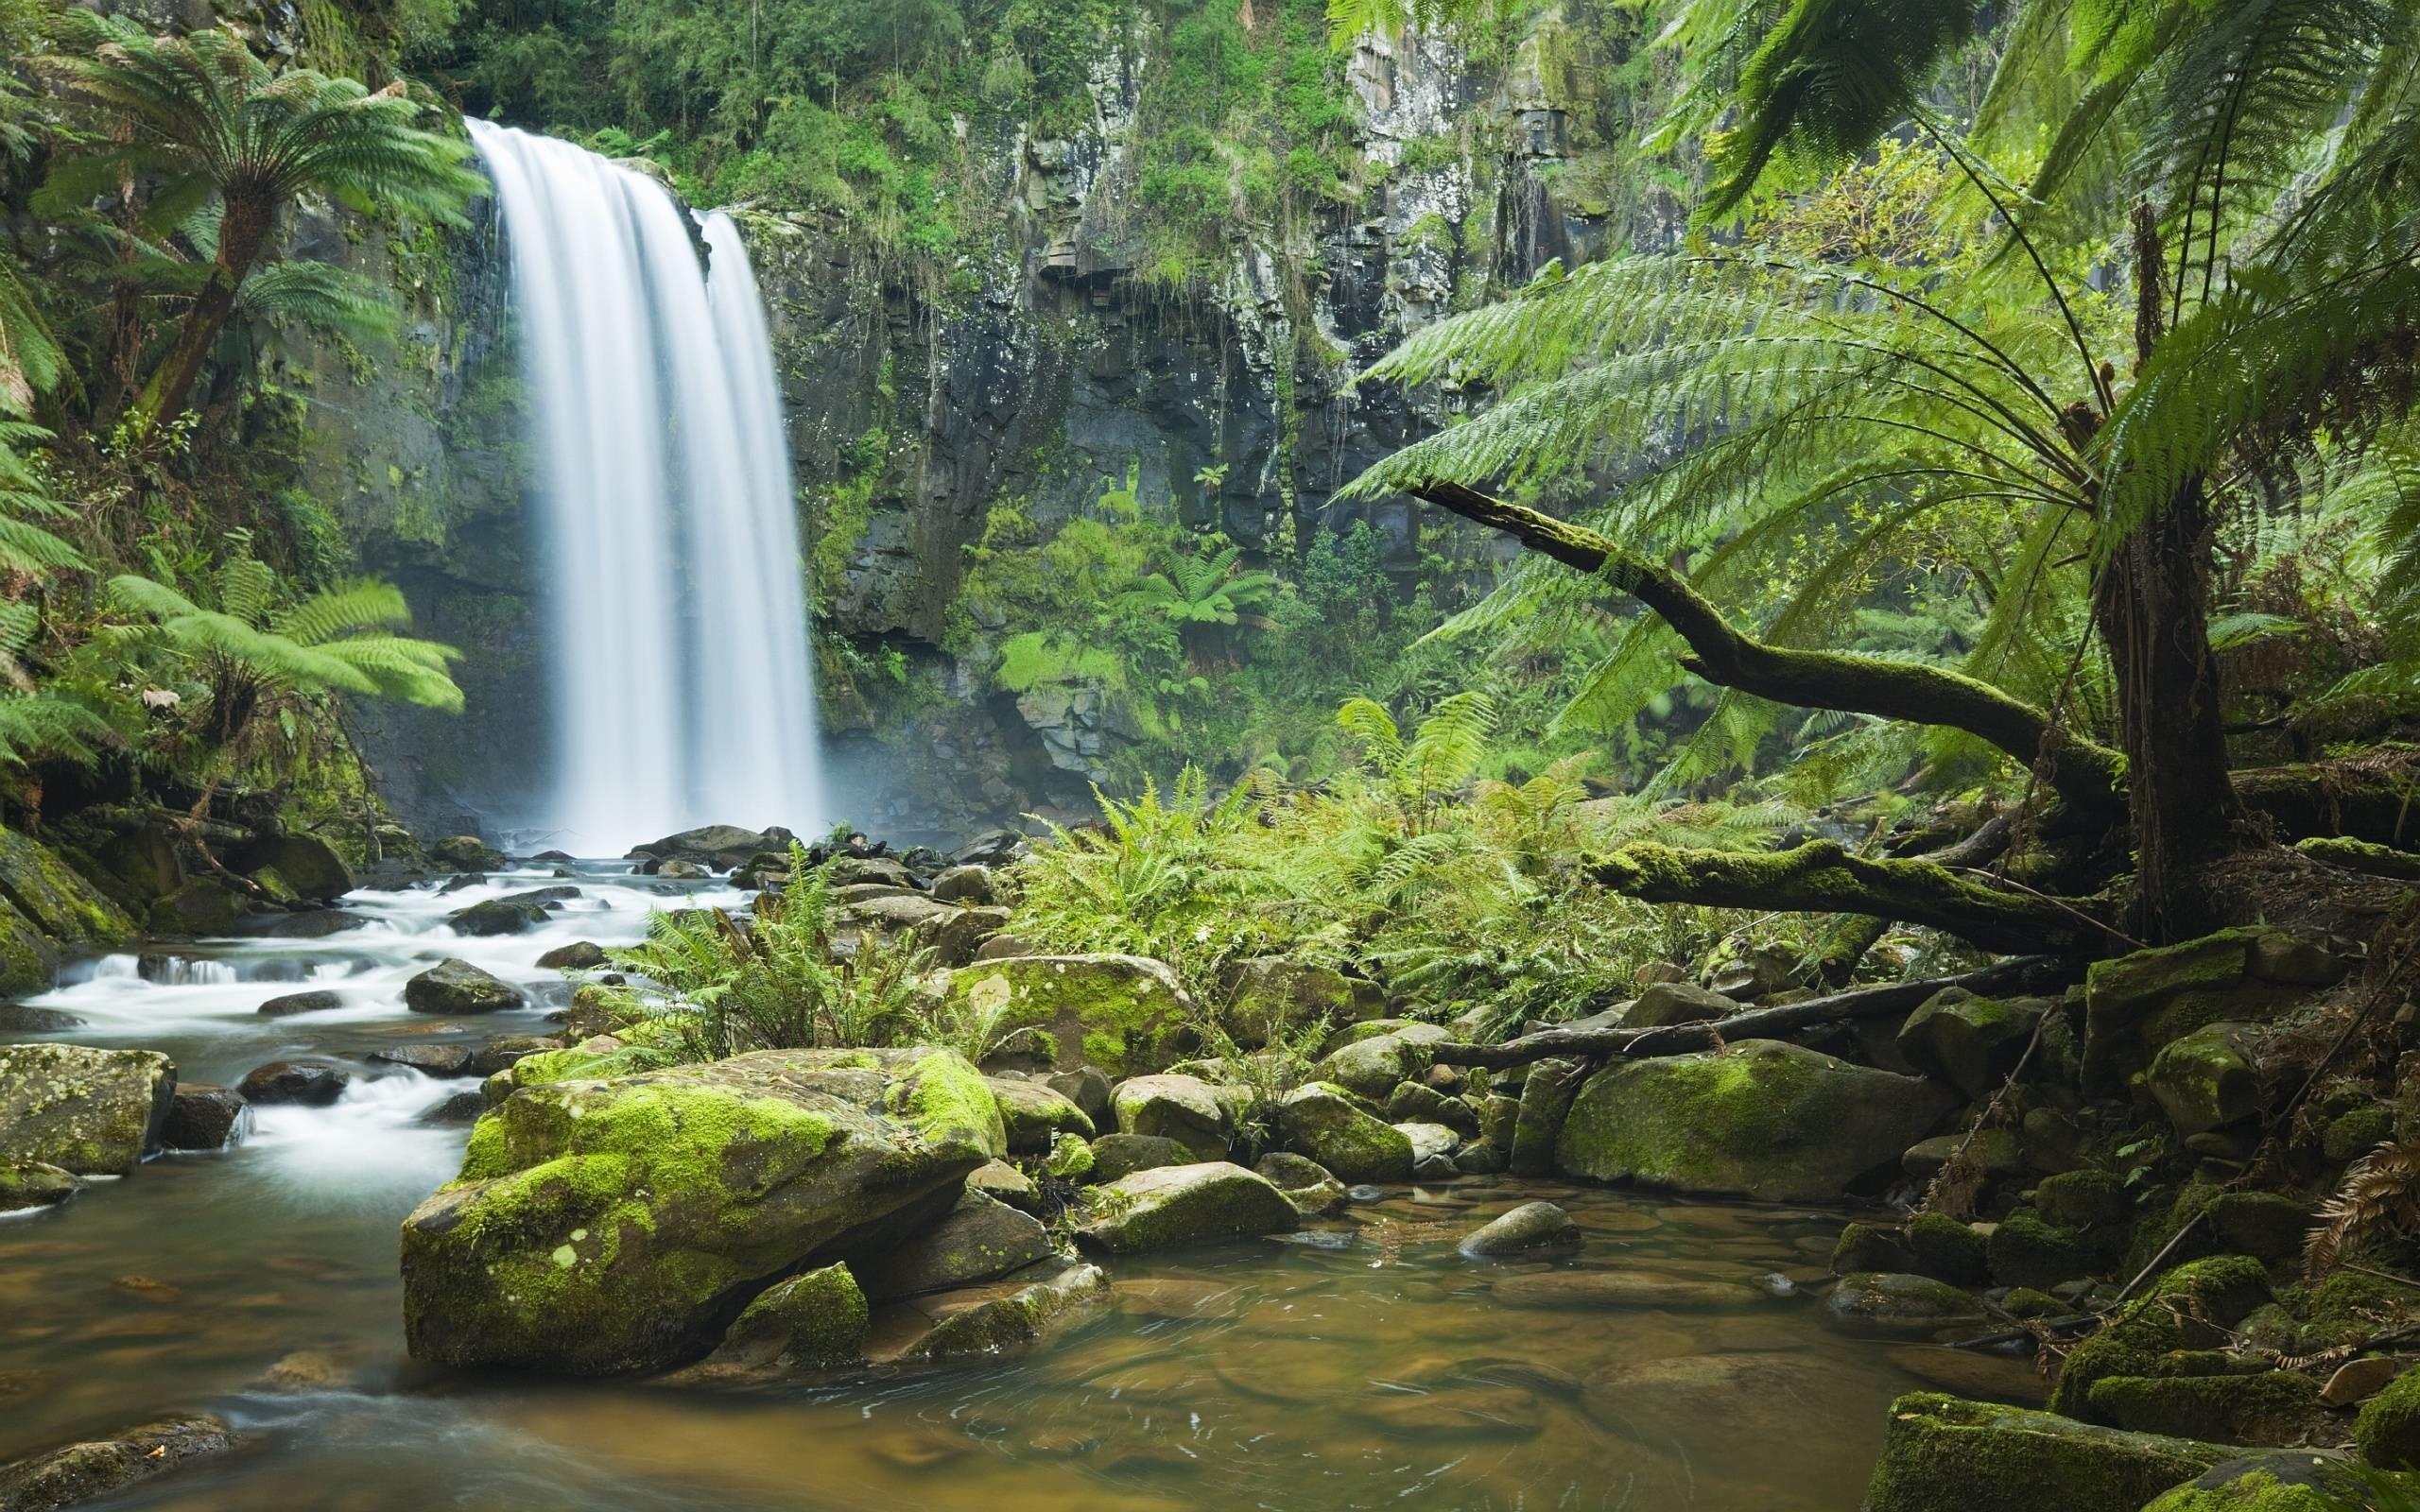 Rainforest Wallpapers – Full HD wallpaper search